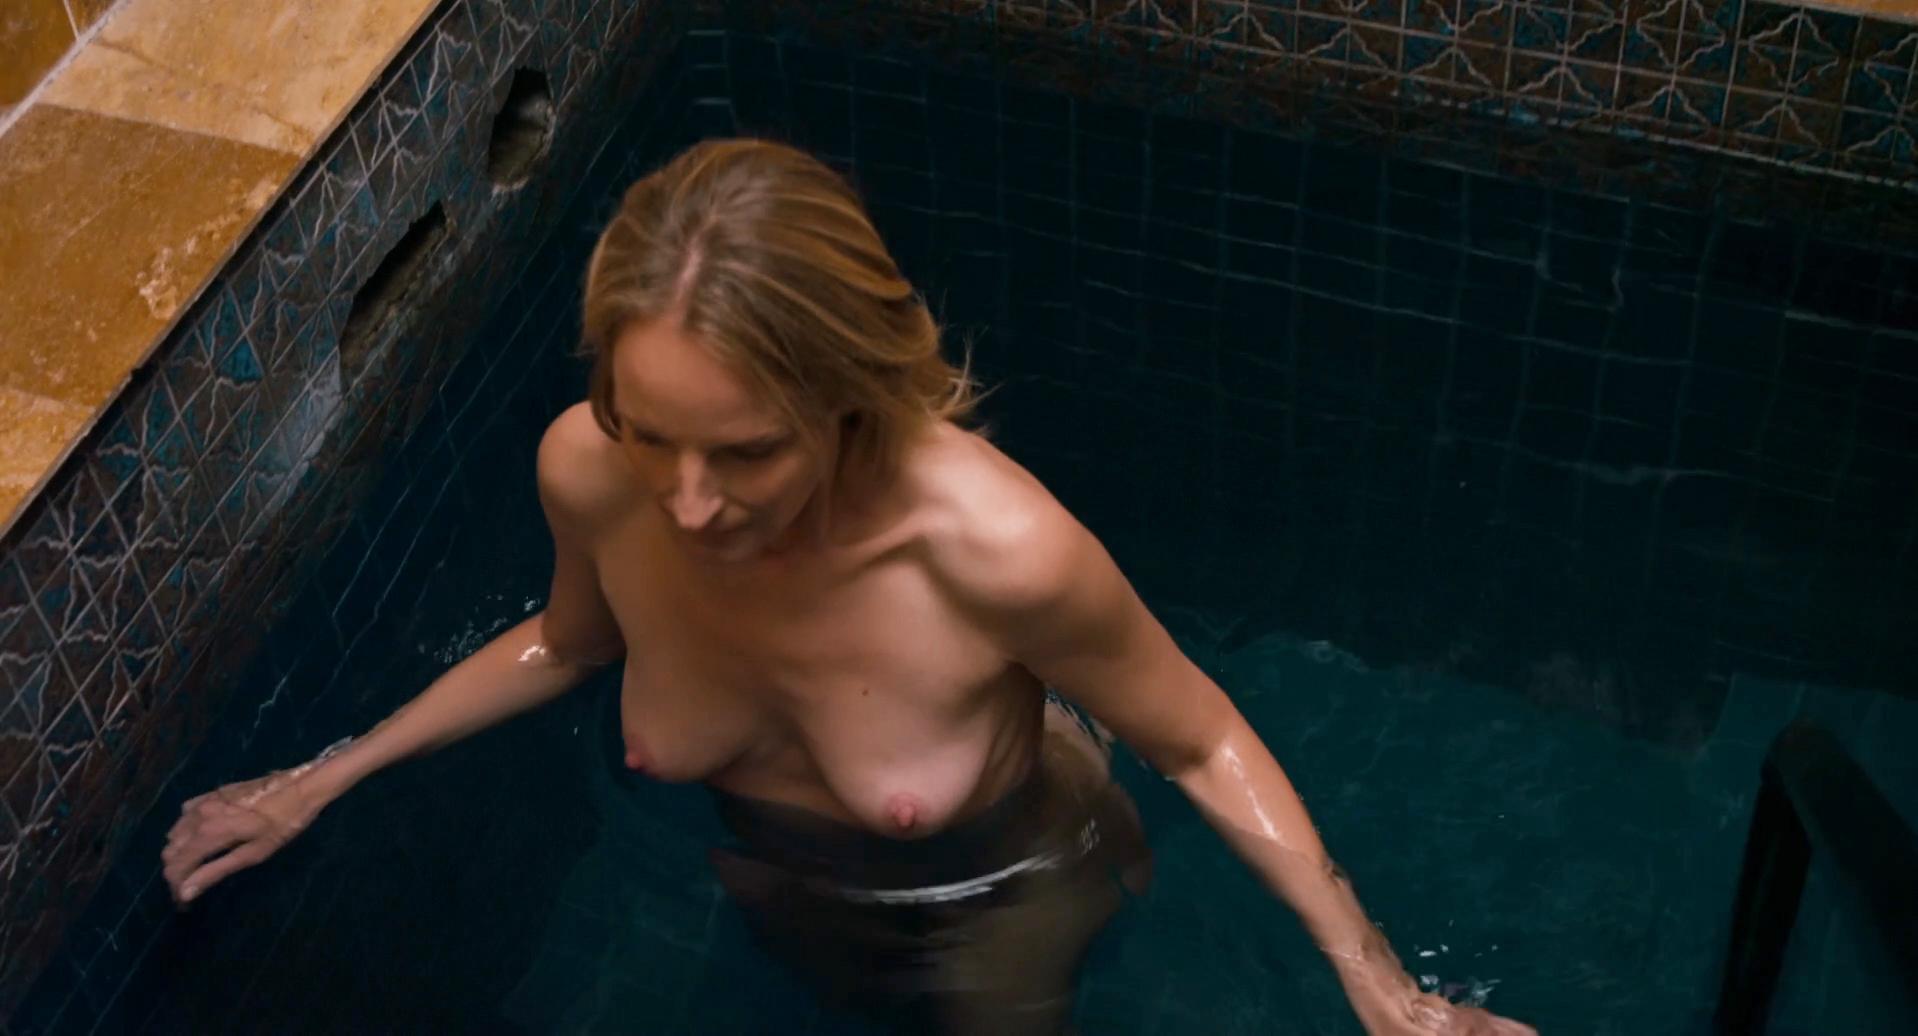 Excalibur Movie Sex Scene watch online - helen hunt – the sessions (2012) hd 720p